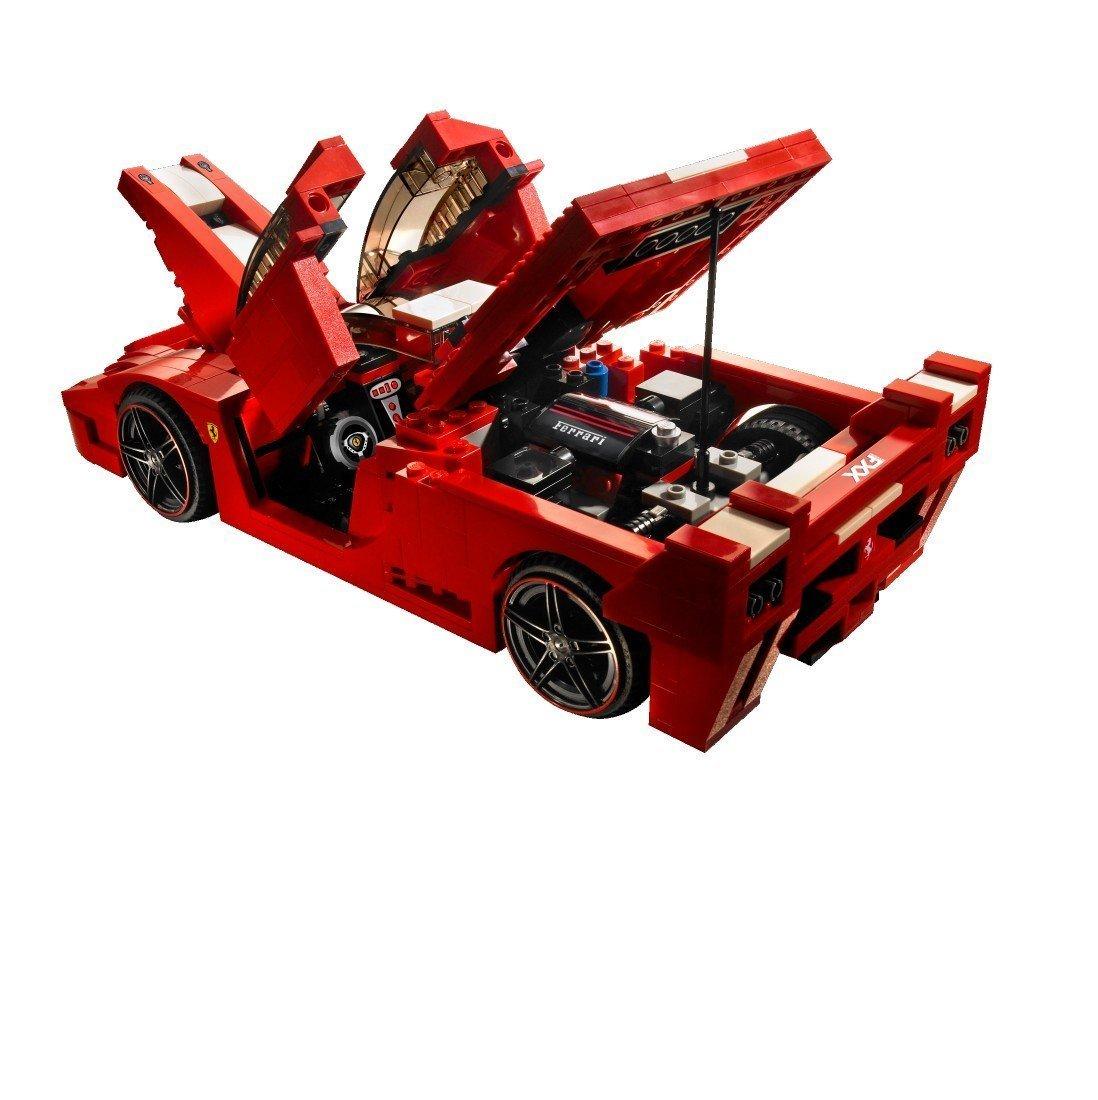 Lego Ferrari Race Cars